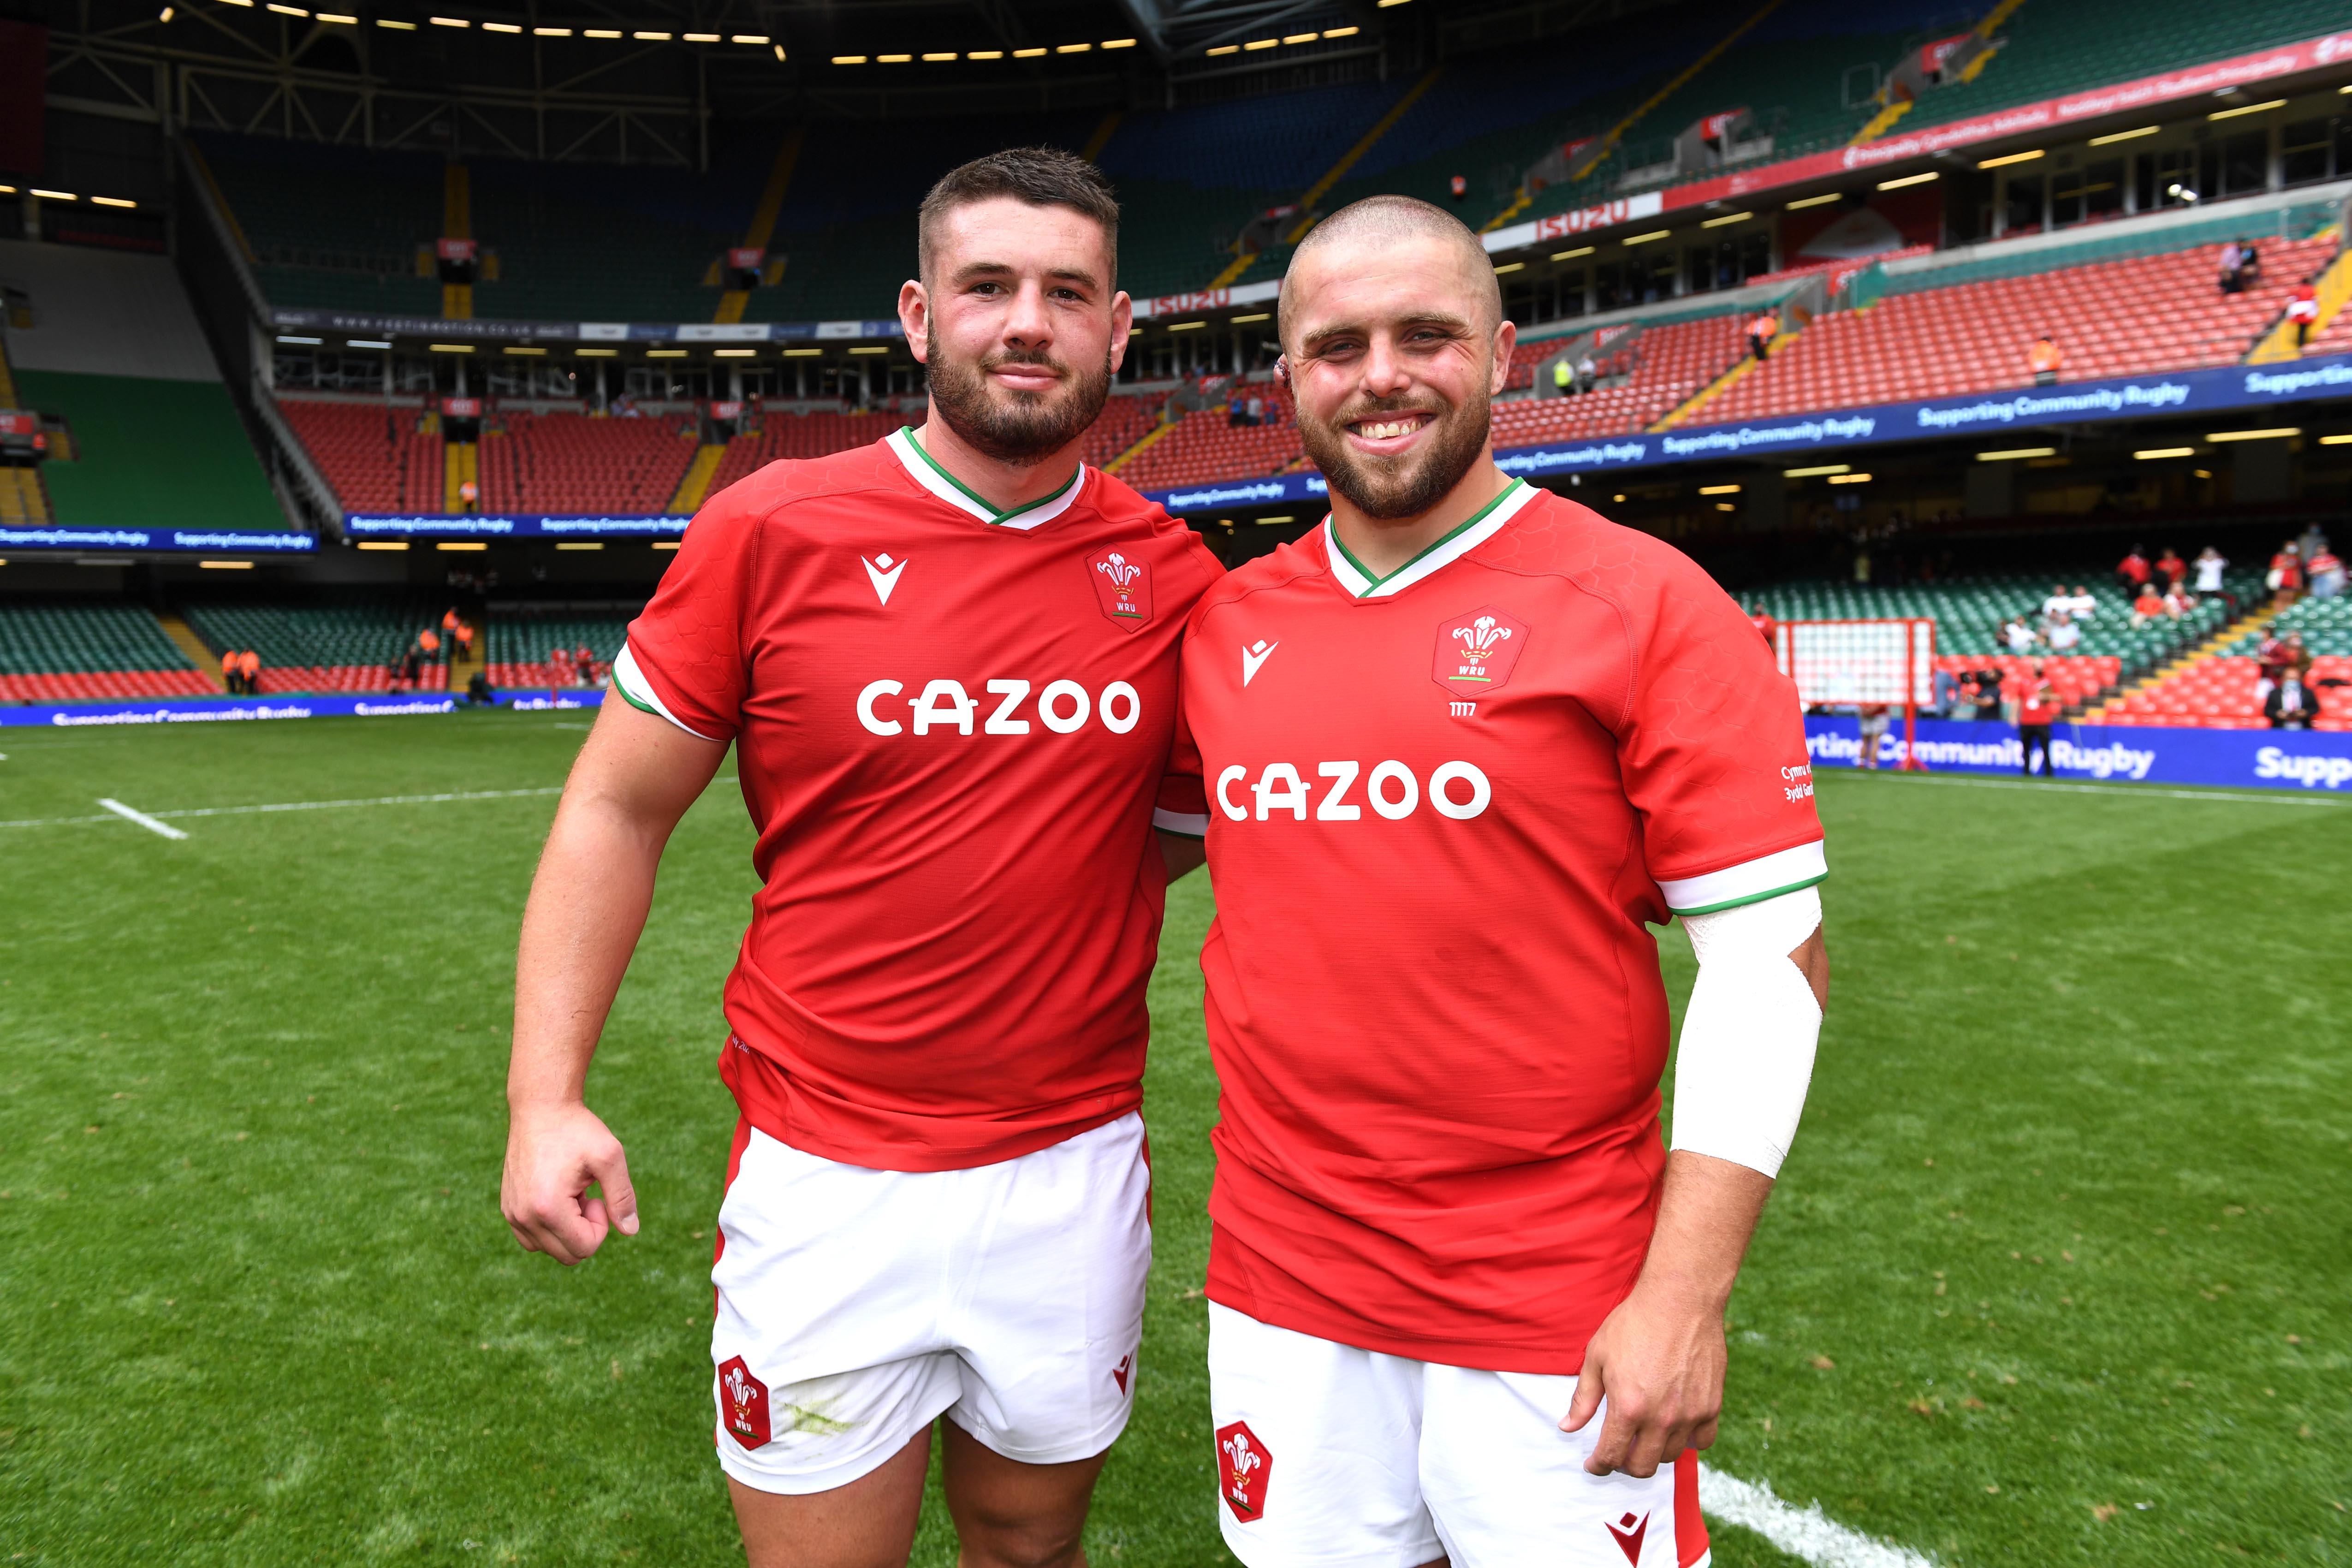 Gareth and Nicky